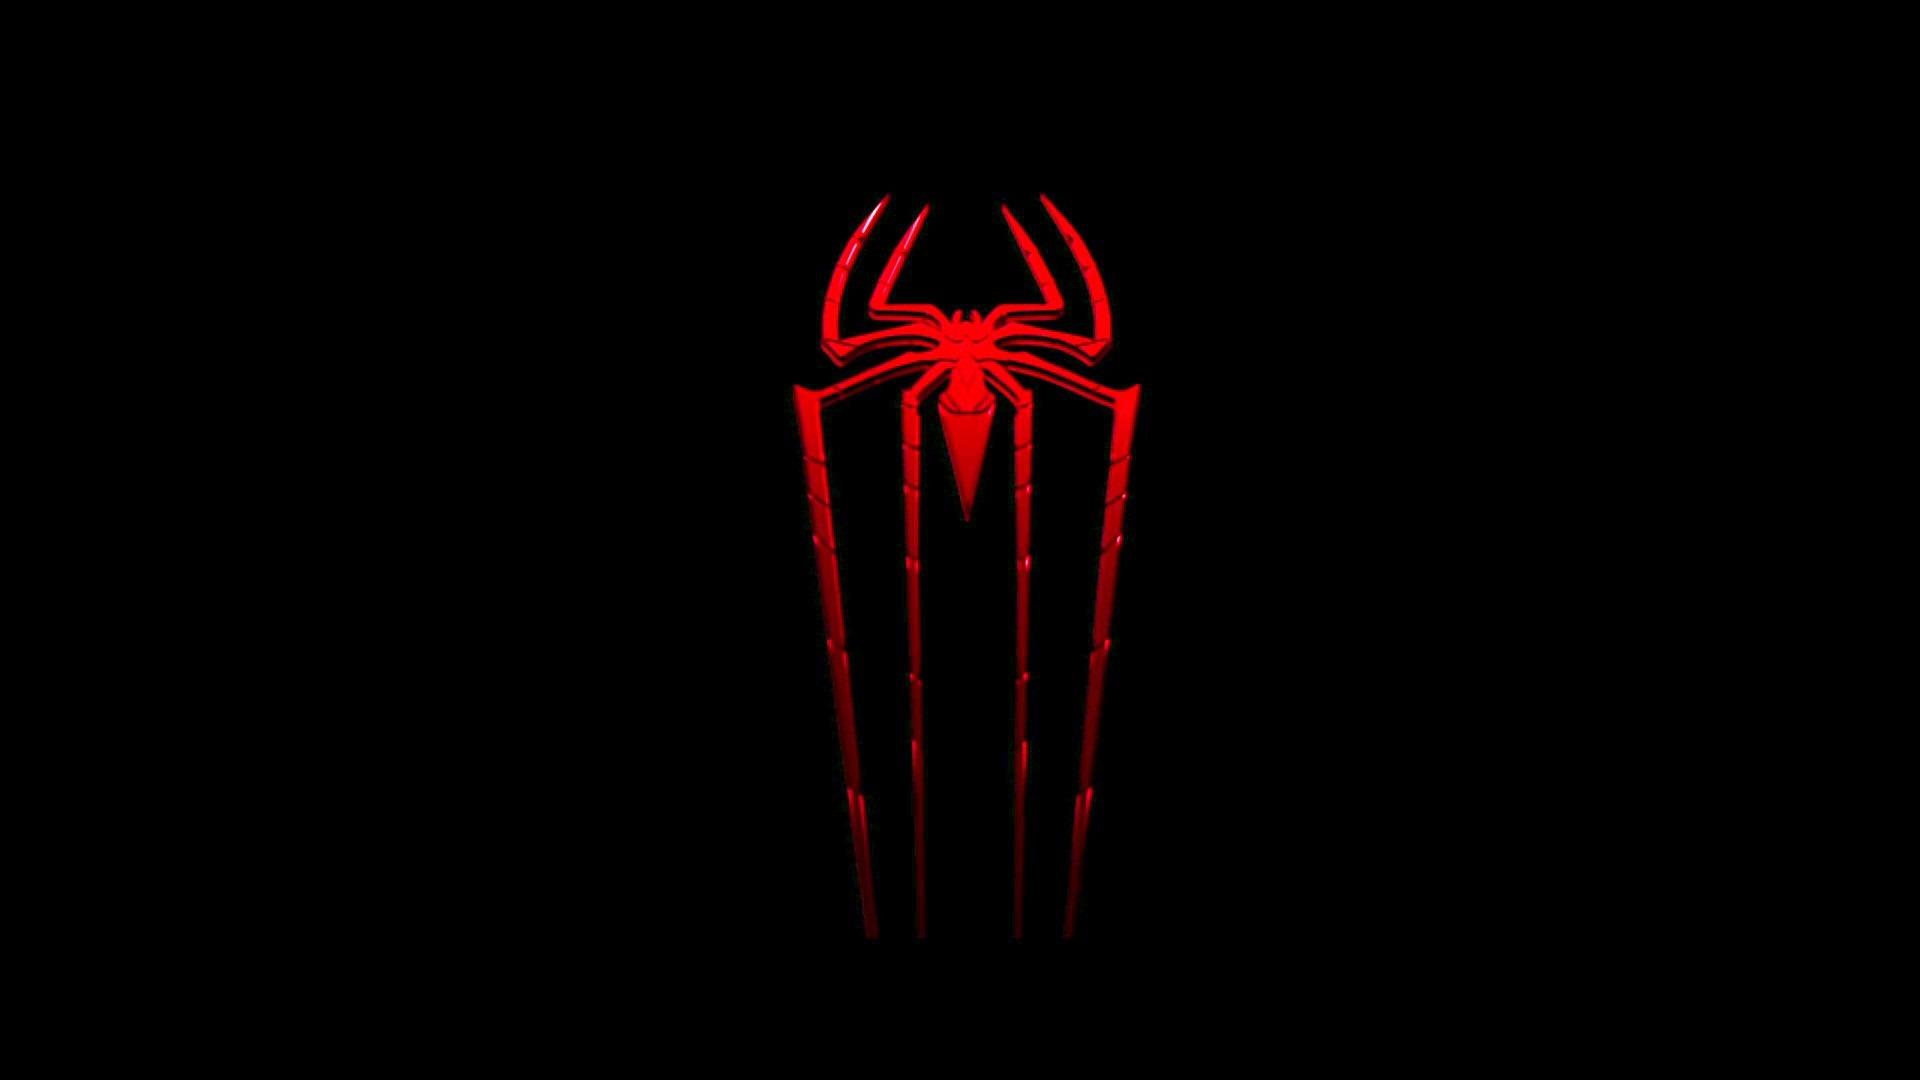 Amazing spider man logo wallpaper - photo#41